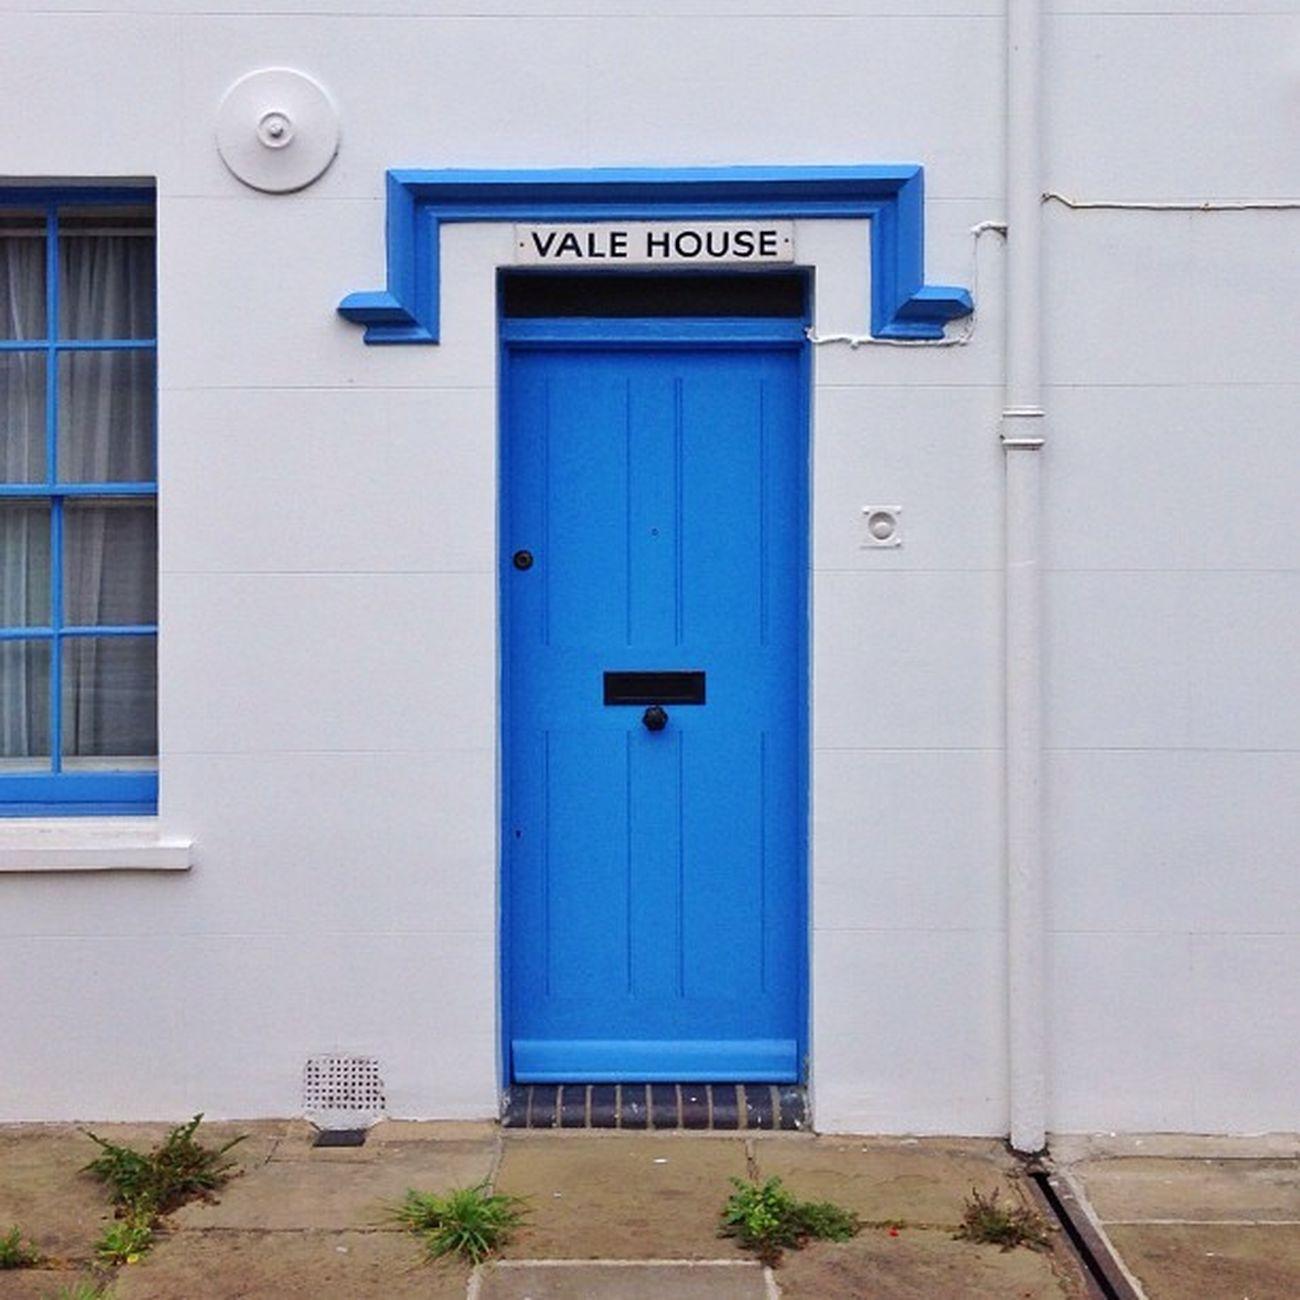 Just the #blue #doors ??☀️????? #hampstead #alan_in_london #gf_uk #gang_family #igers_london #insta_london #london_only #thisislondon #from_city #ic_cities_london #ig_england #love_london #gi_uk #ig_london #londonpop #allshots_ #aauk #mashpics #pro_shoo Igers_london Ig_england Love_london Ic_cities_london Doors Ig_london Blue Aauk Gang_family Capture_today Londonpop Loveyoursummer Allshots_ Mashpics London_only Top_masters Hampstead  From_city Gf_uk Pro_shooters Alan_in_london Insta_london Thisislondon Gi_uk